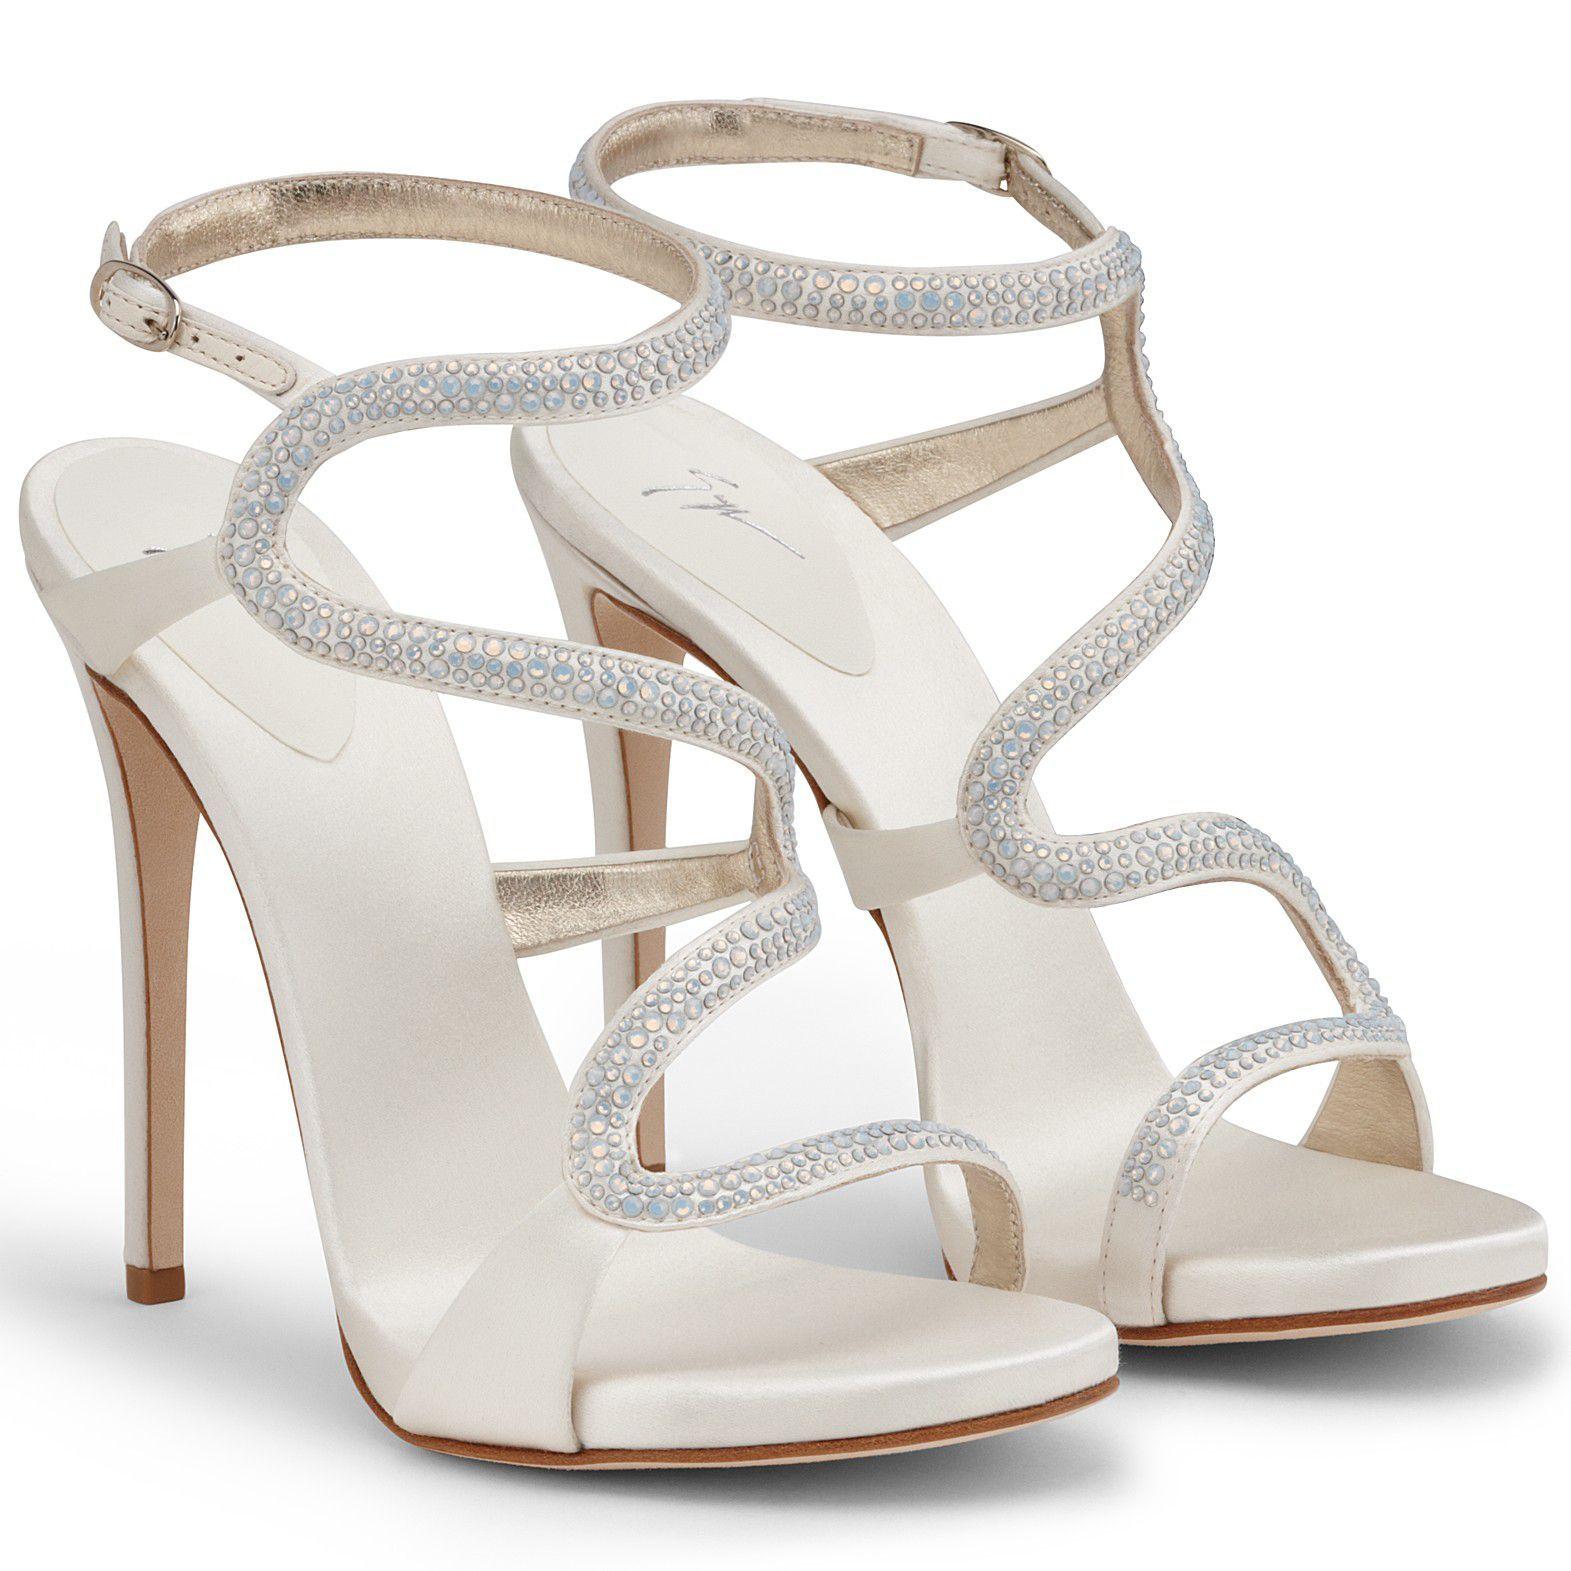 Wedding Bridal Shoes By Giuseppe Zanotti // Model Alysa // Satin And  Crystals